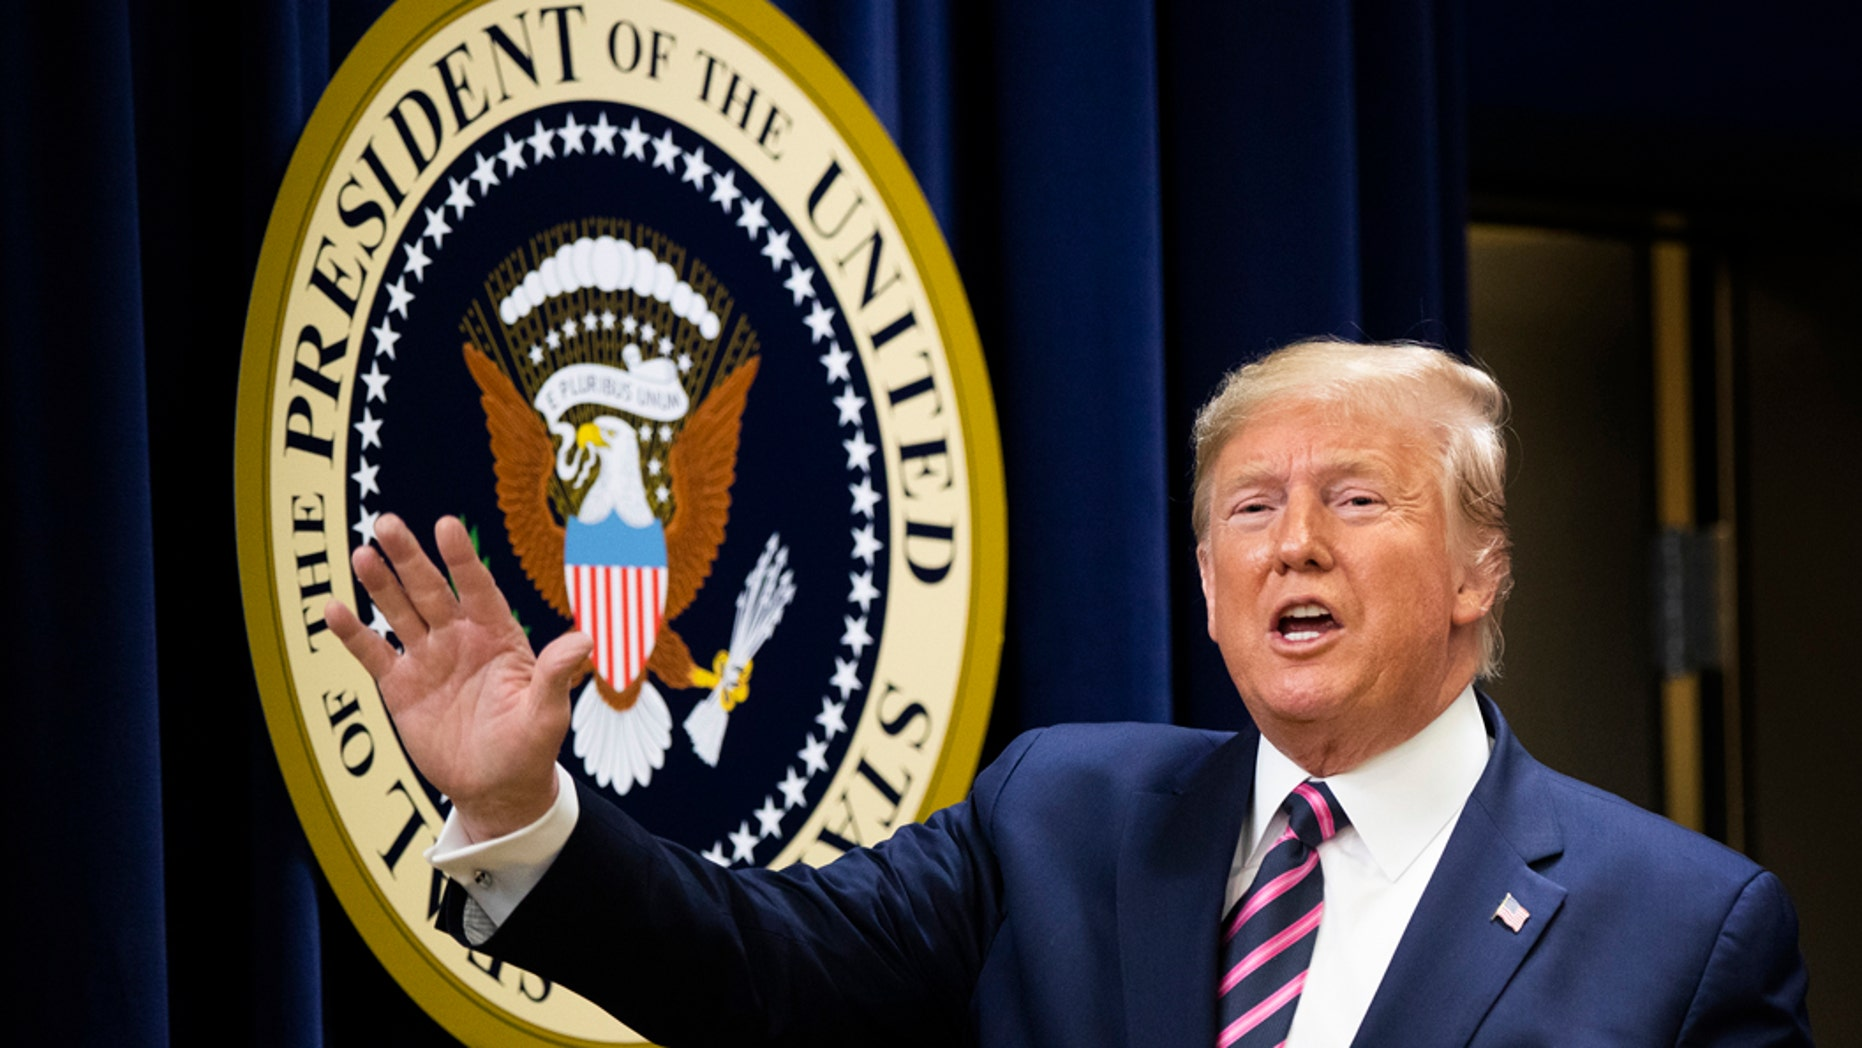 Westlake Legal Group trump-space-force Space Force will start small but let Trump claim a big win fox-news/tech/topics/us-army fnc/tech fnc cc4ba71d-fc57-5bca-8cf0-41b9293d480f Associated Press article